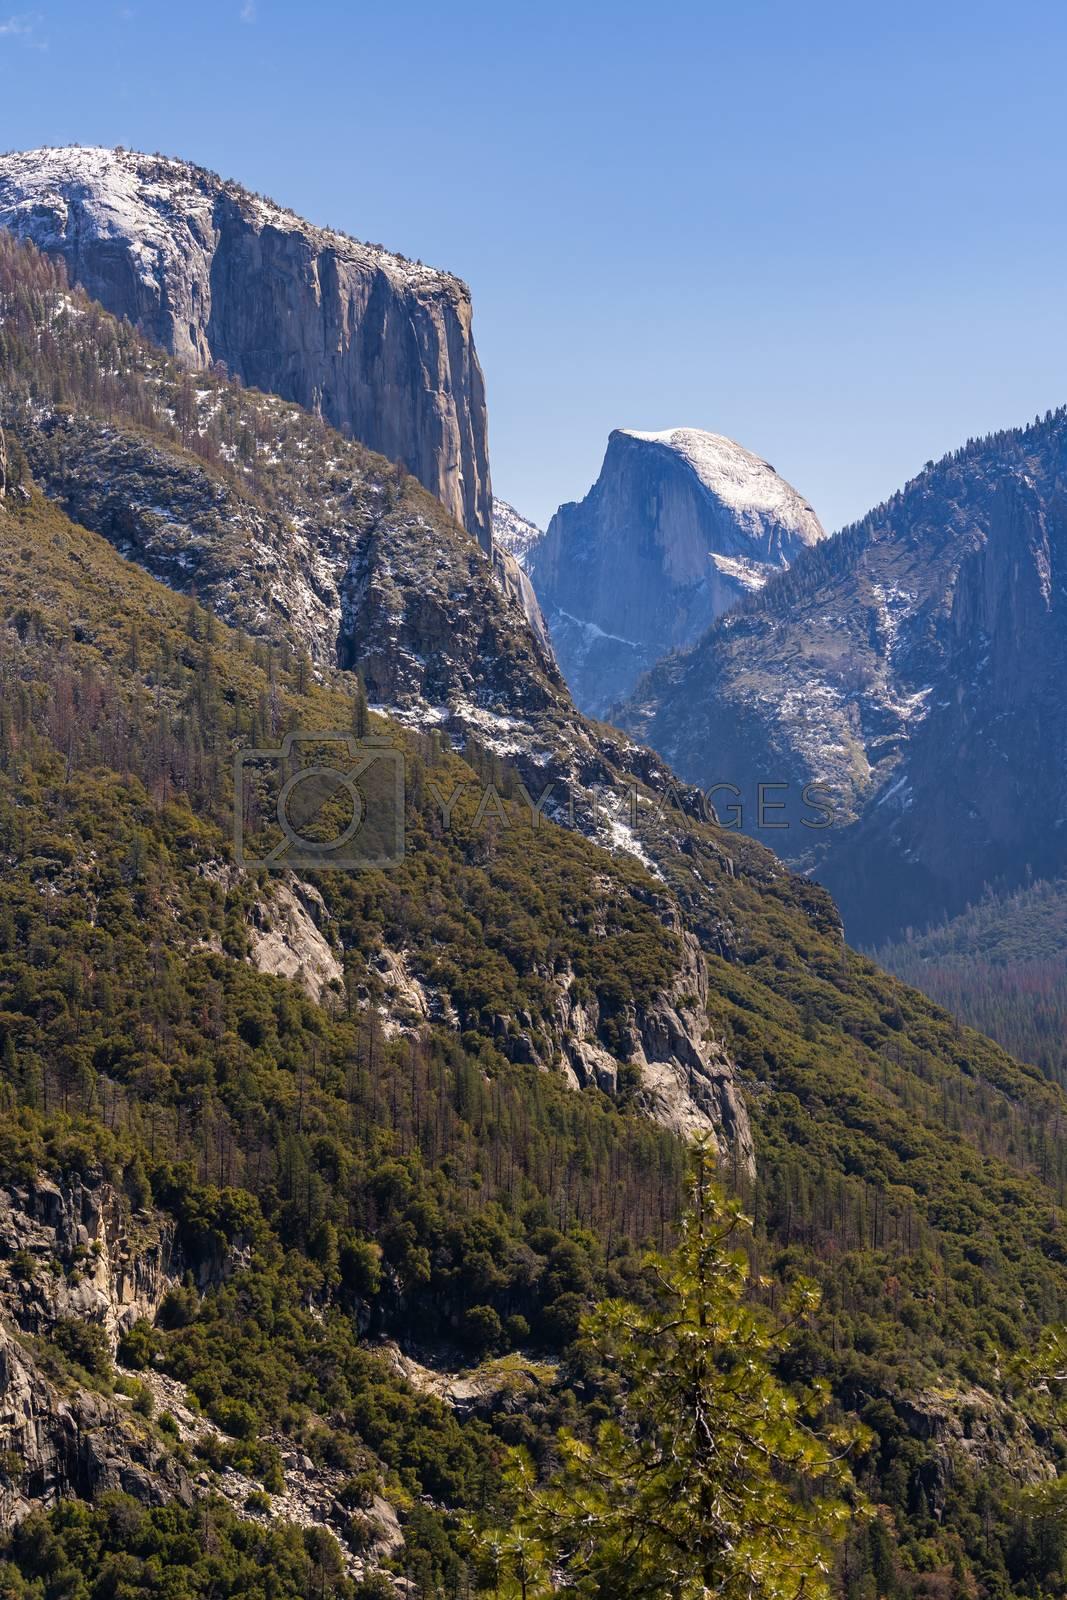 Yosemite national Park in California San Francisco USA